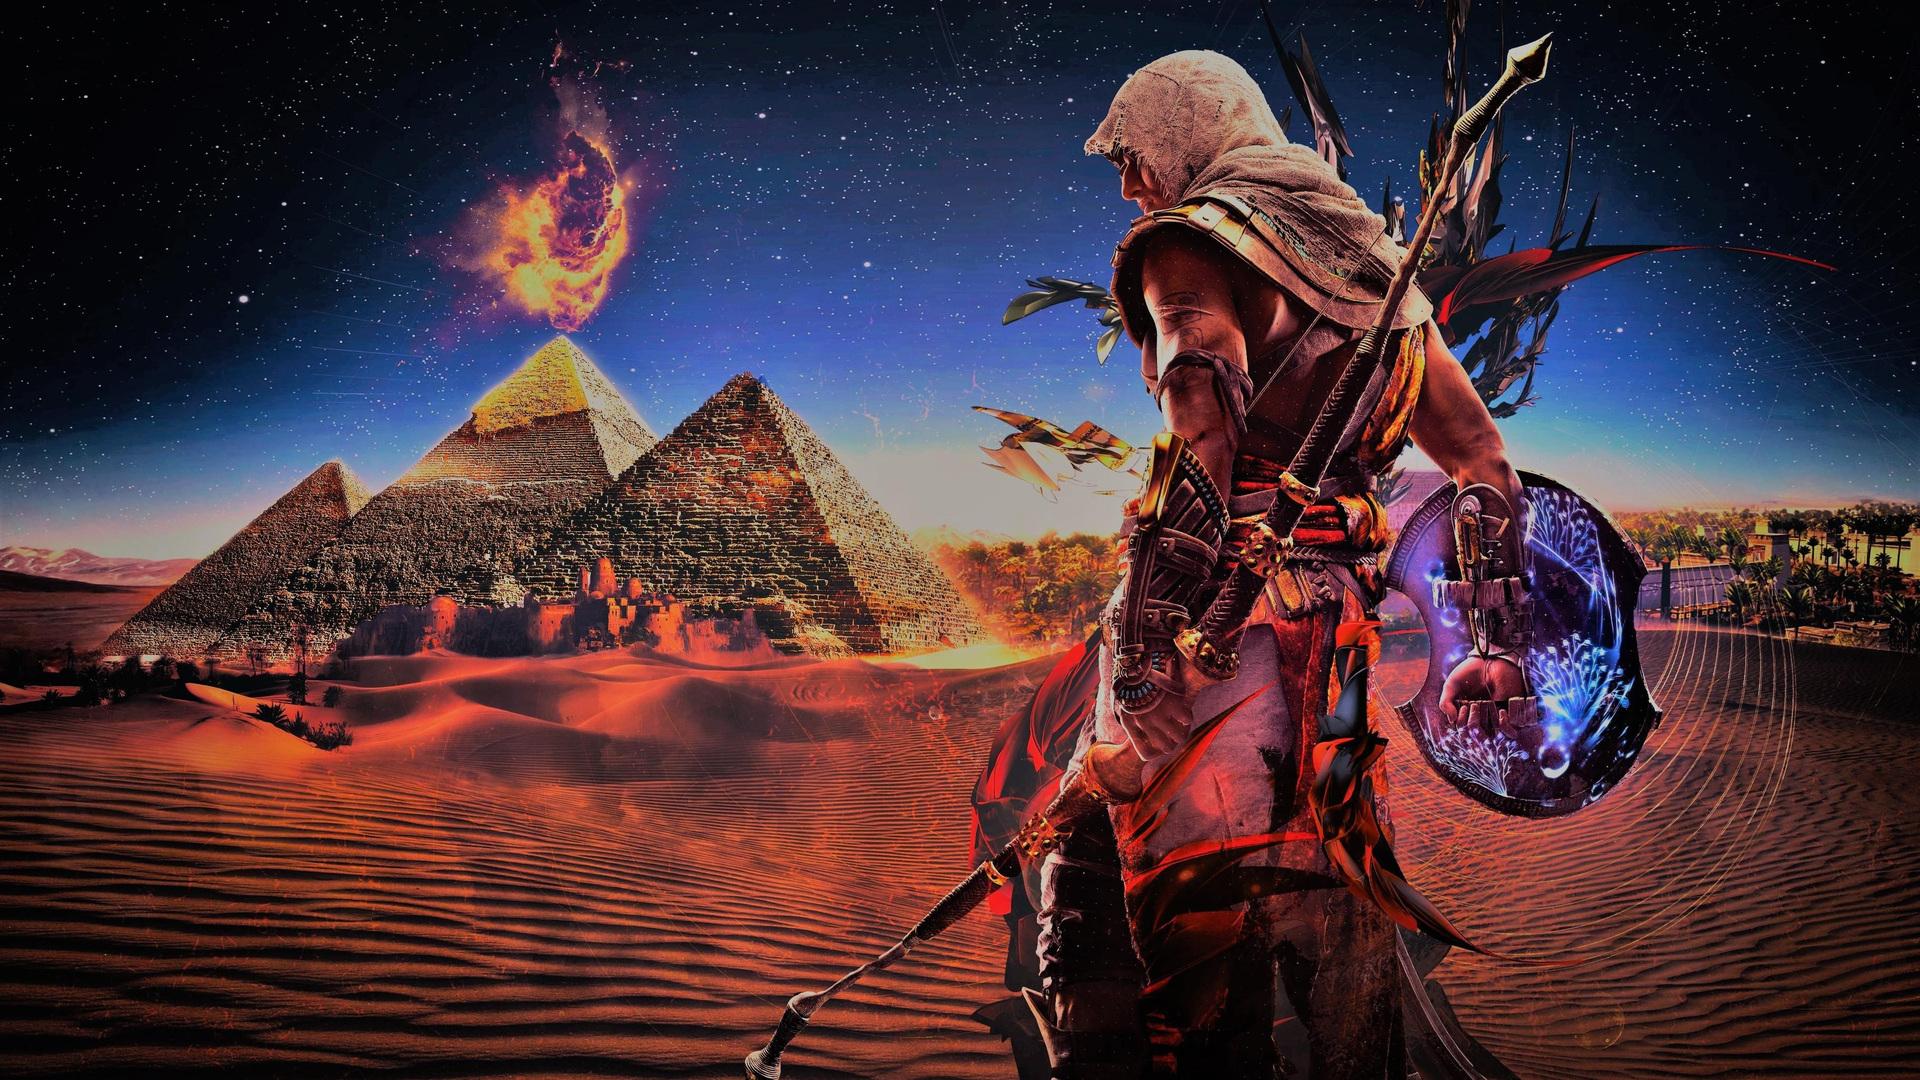 1920x1080 2018 Assassins Creed Origins 4k Laptop Full HD ...